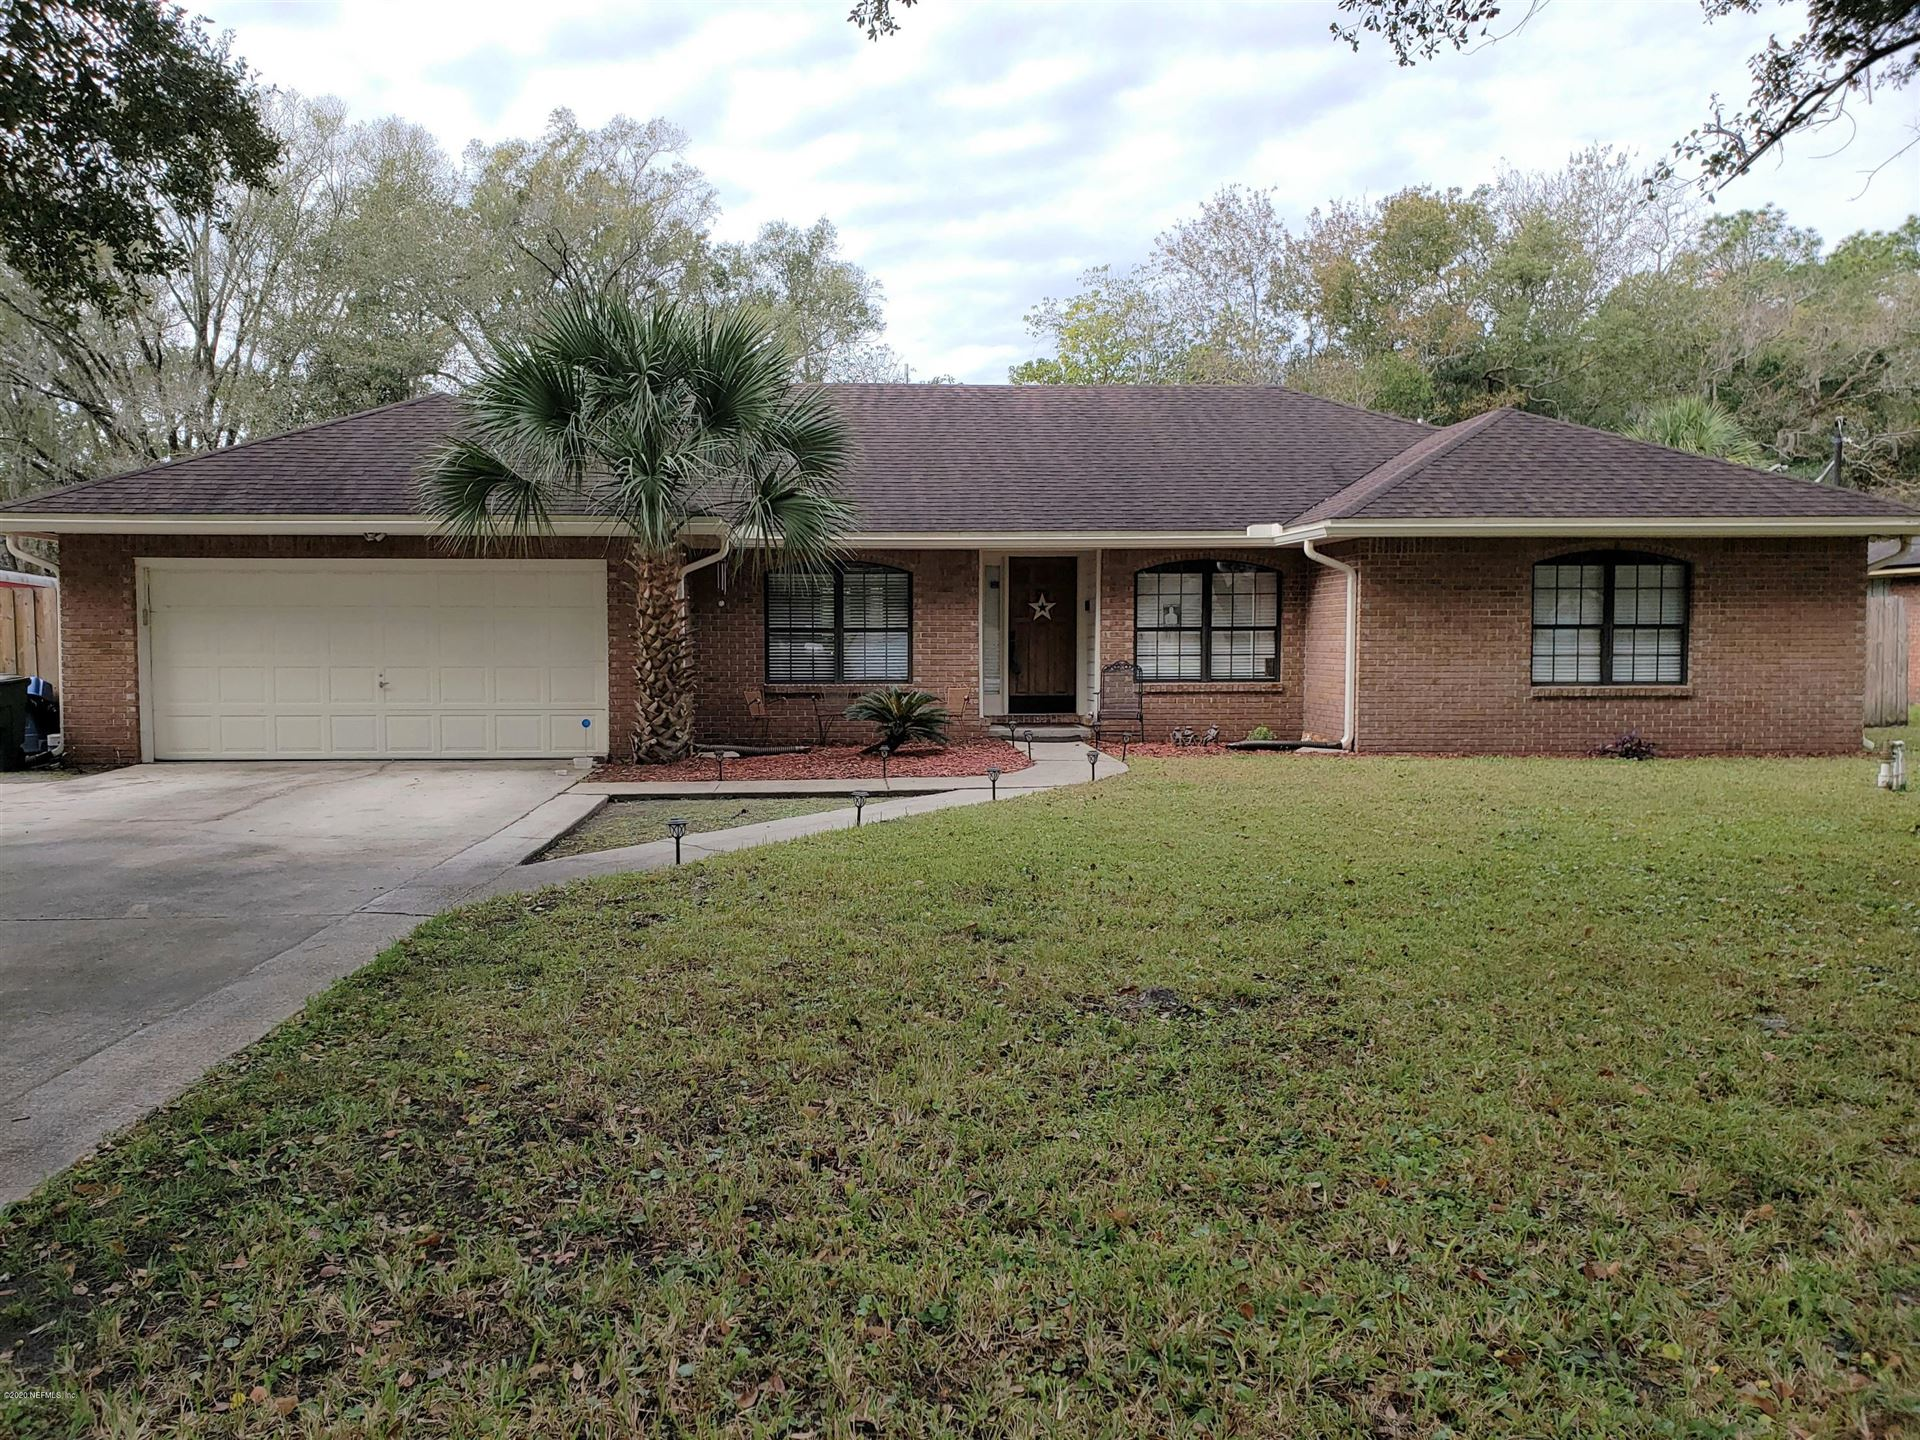 1224 COX RD, Jacksonville, FL 32221 - MLS#: 1085269